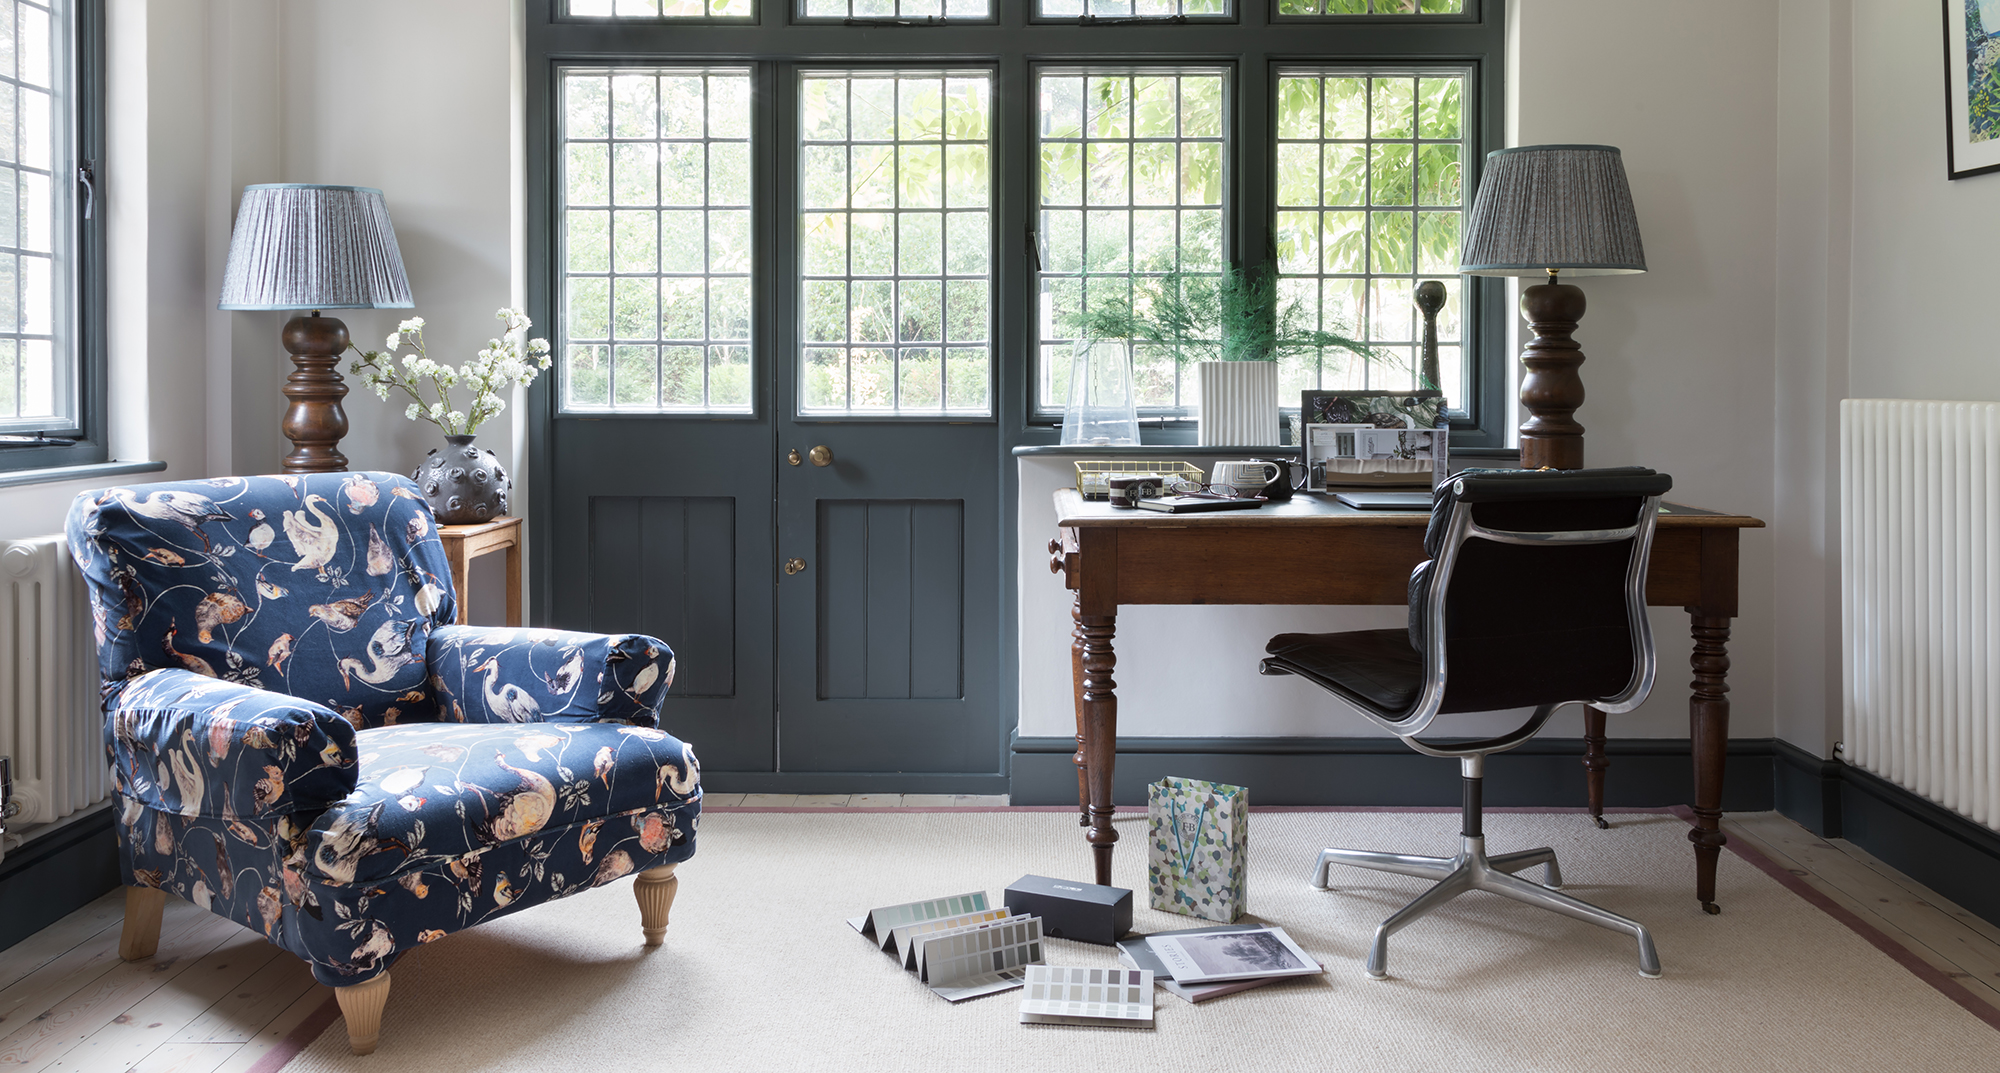 Office-design-Alison-Anderson-Interiors.jpg